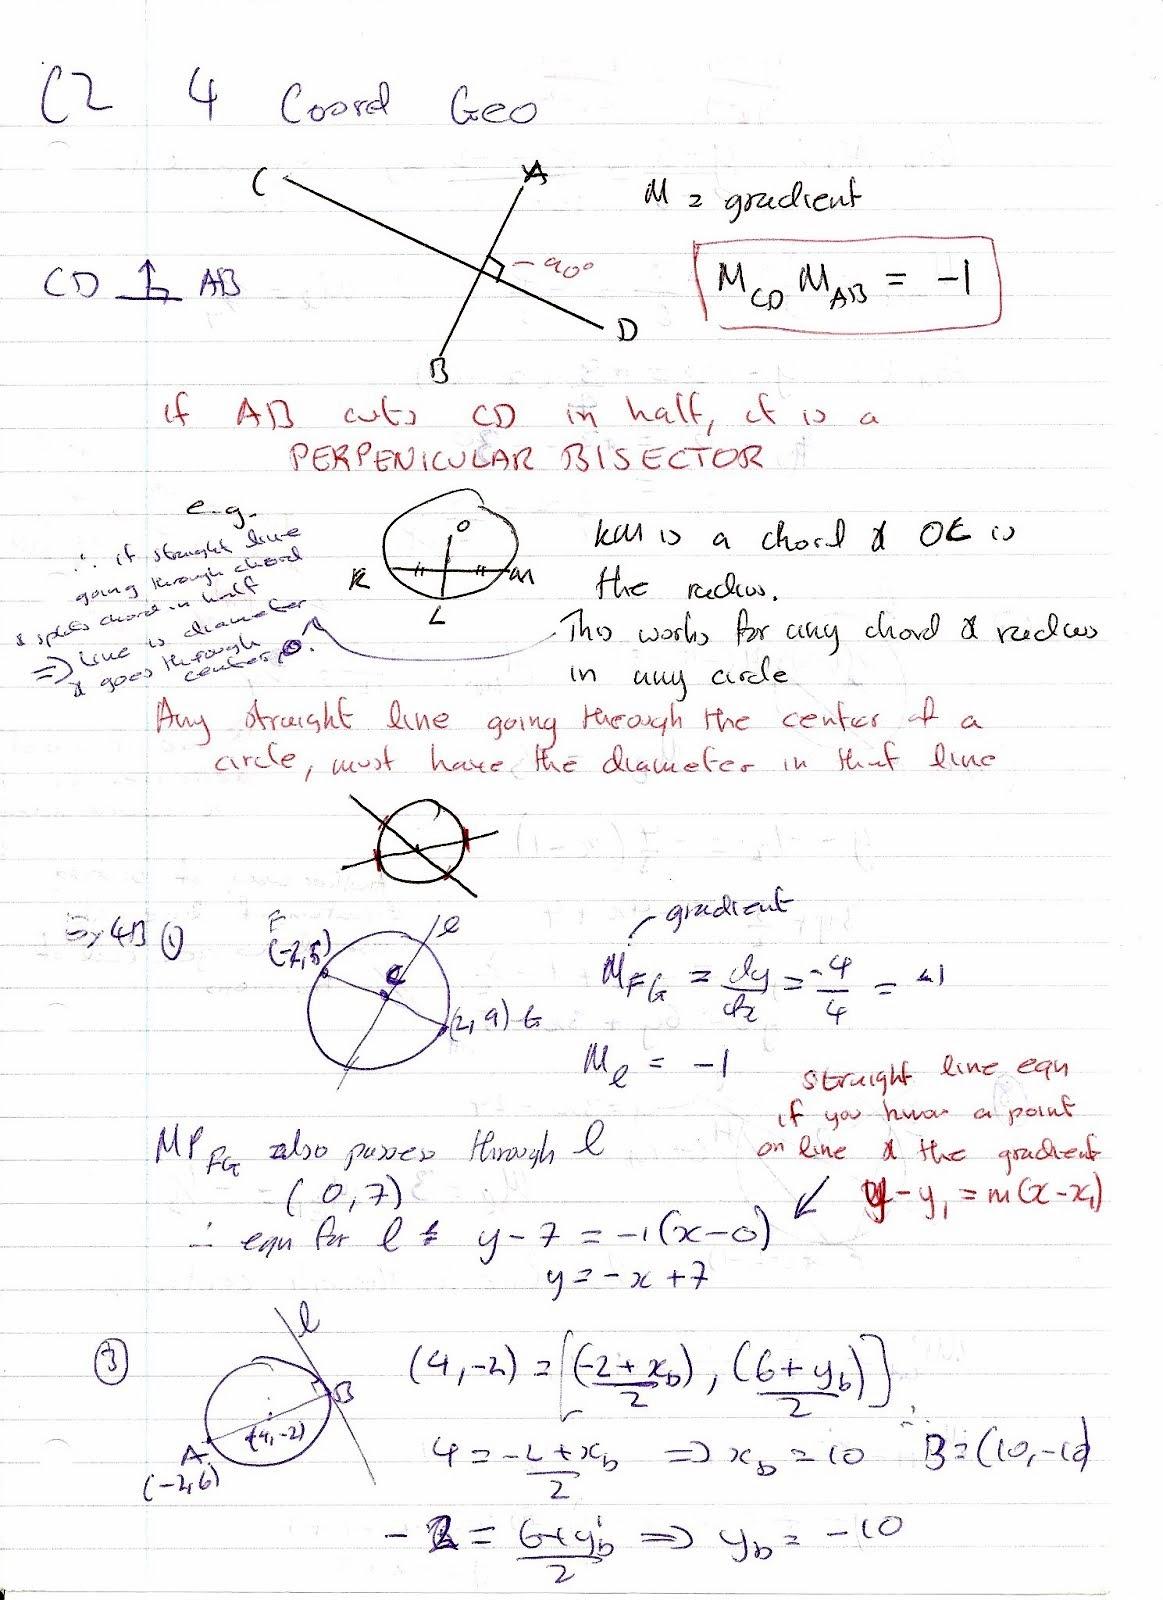 A Level Maths Notes Edexcel C2 4 Coordinate Geometry